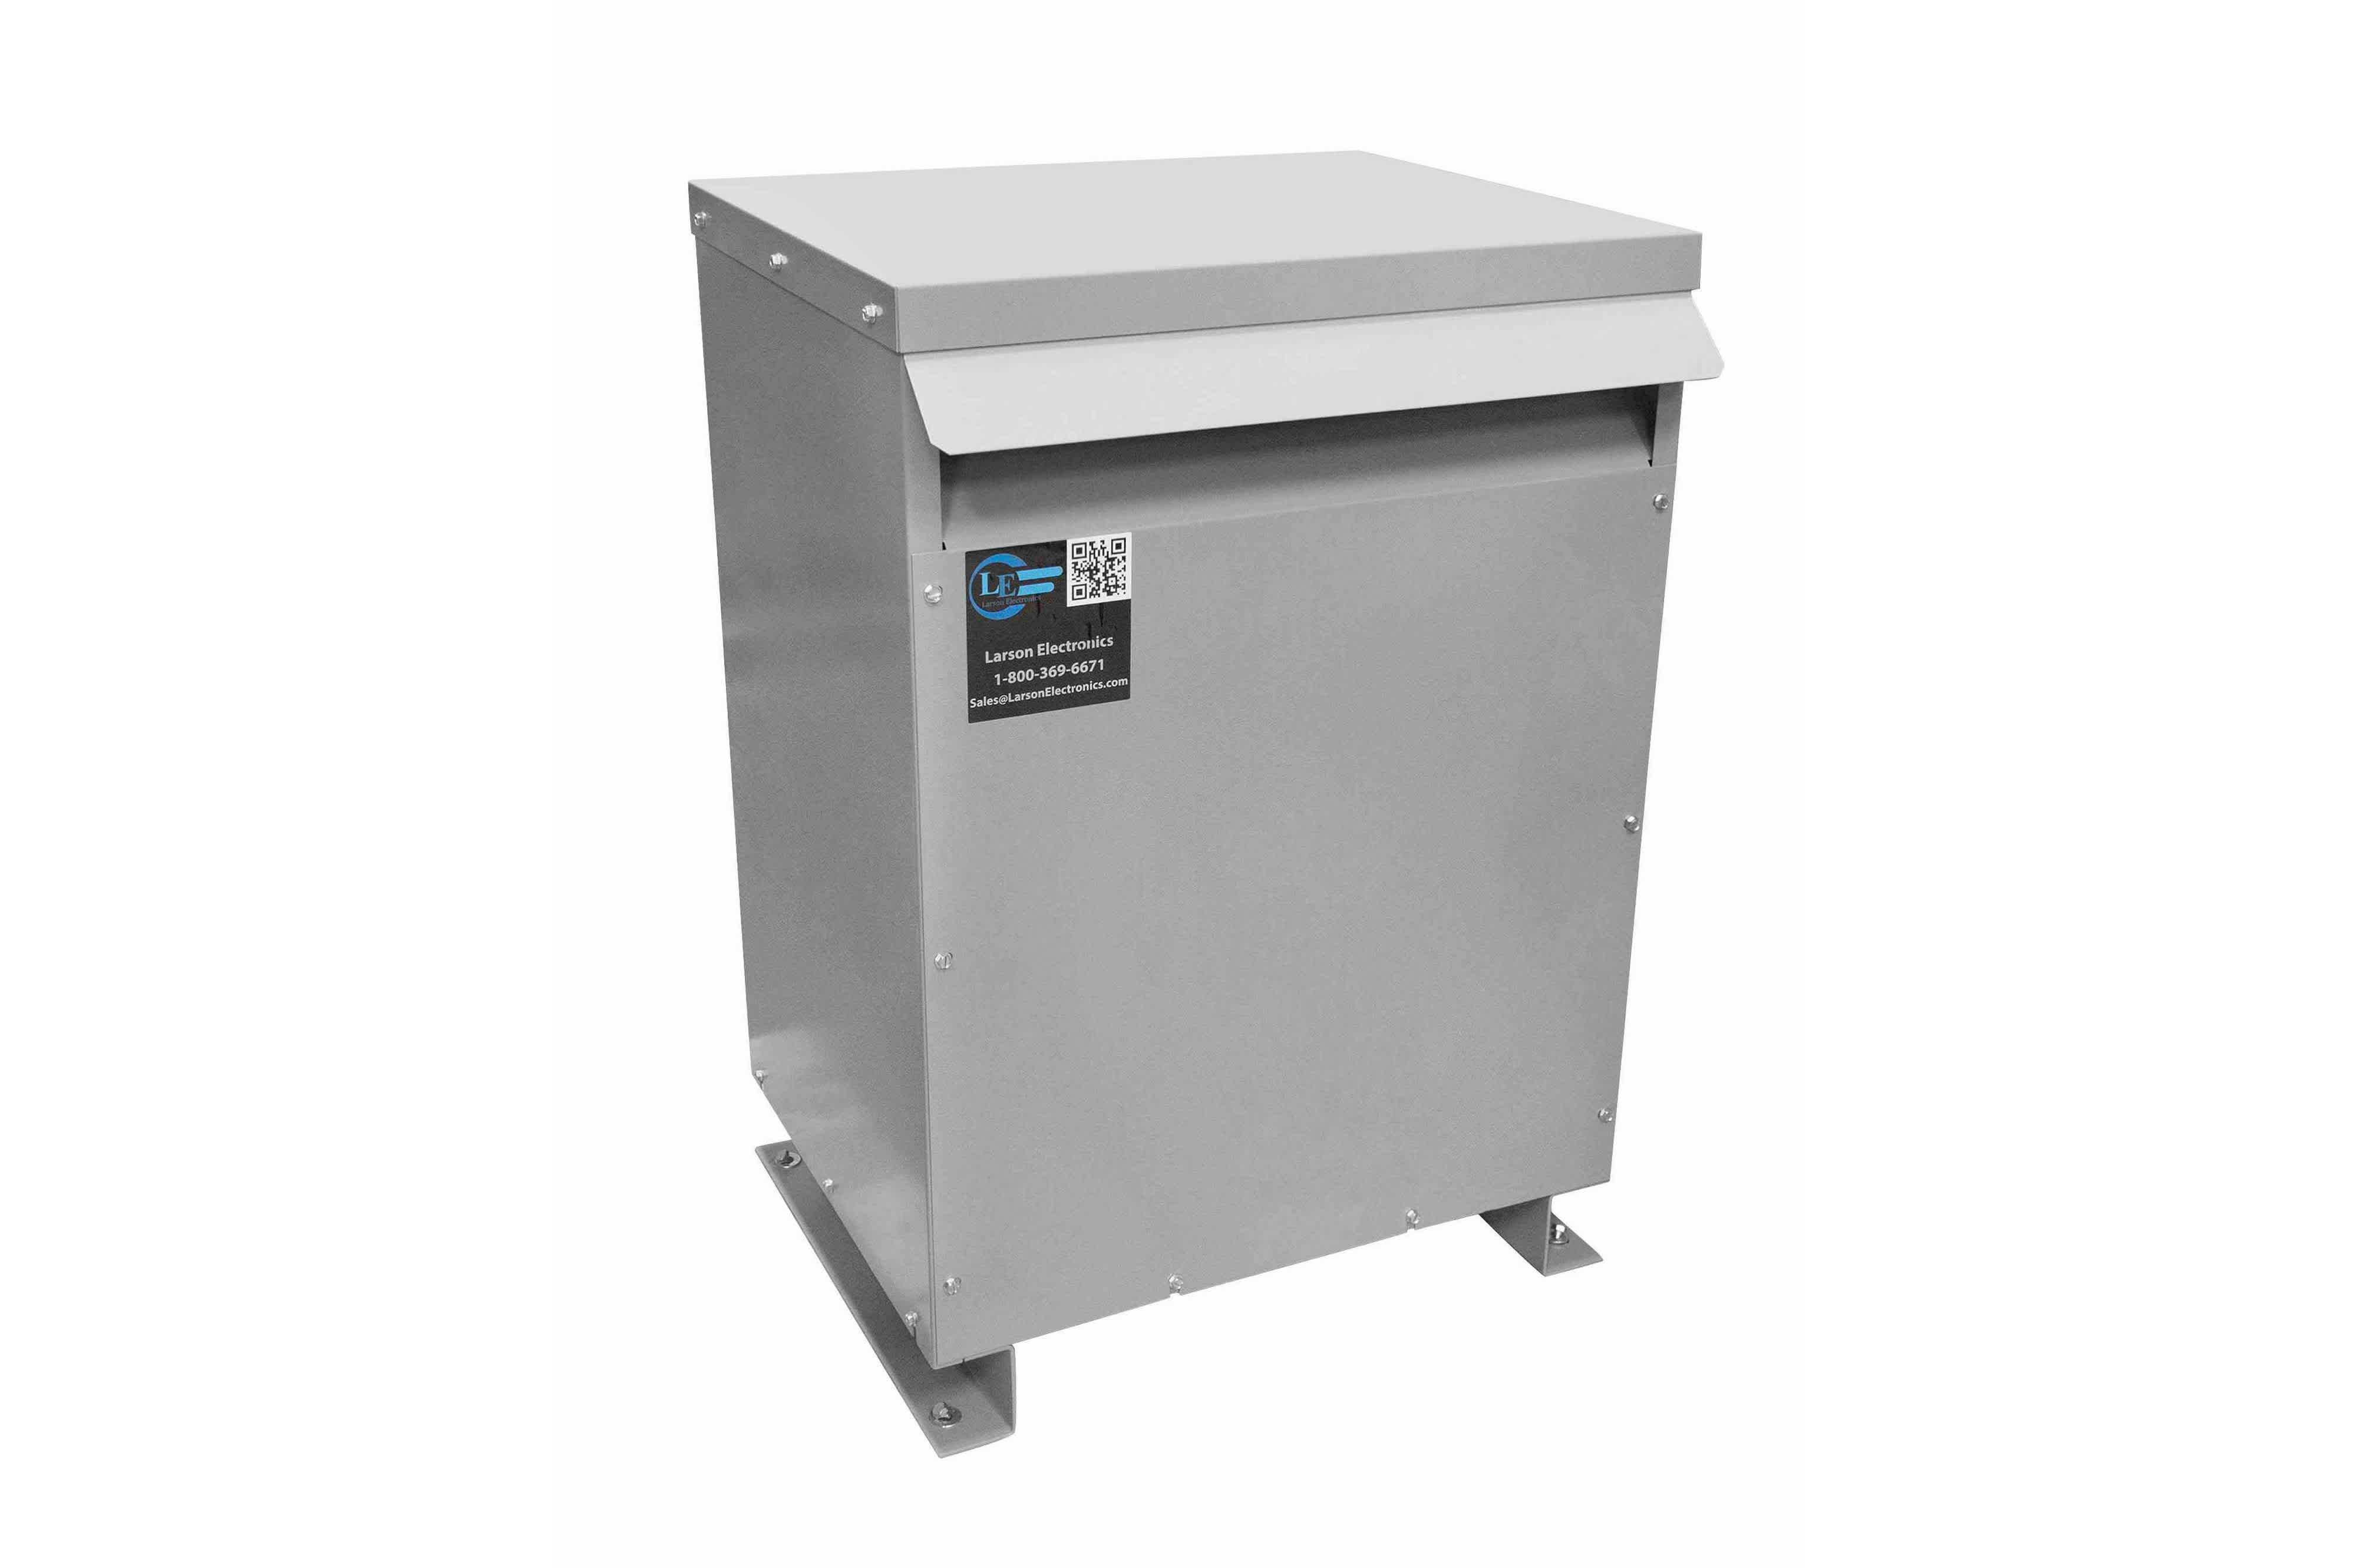 29 kVA 3PH Isolation Transformer, 208V Wye Primary, 415V Delta Secondary, N3R, Ventilated, 60 Hz